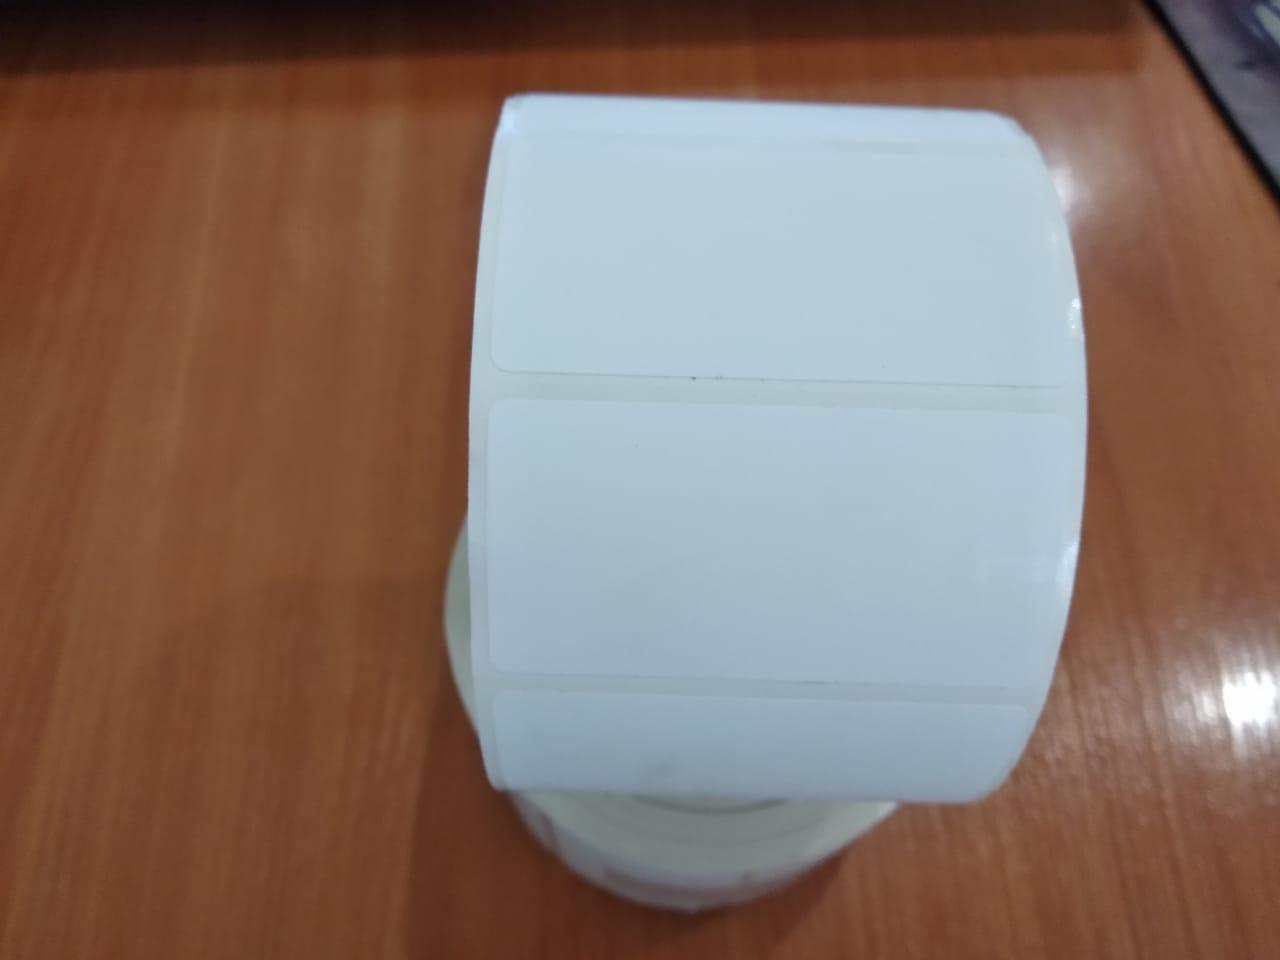 Гарантийная этикетка (скорлупа) 58*30мм (1000 шт) - фото 1